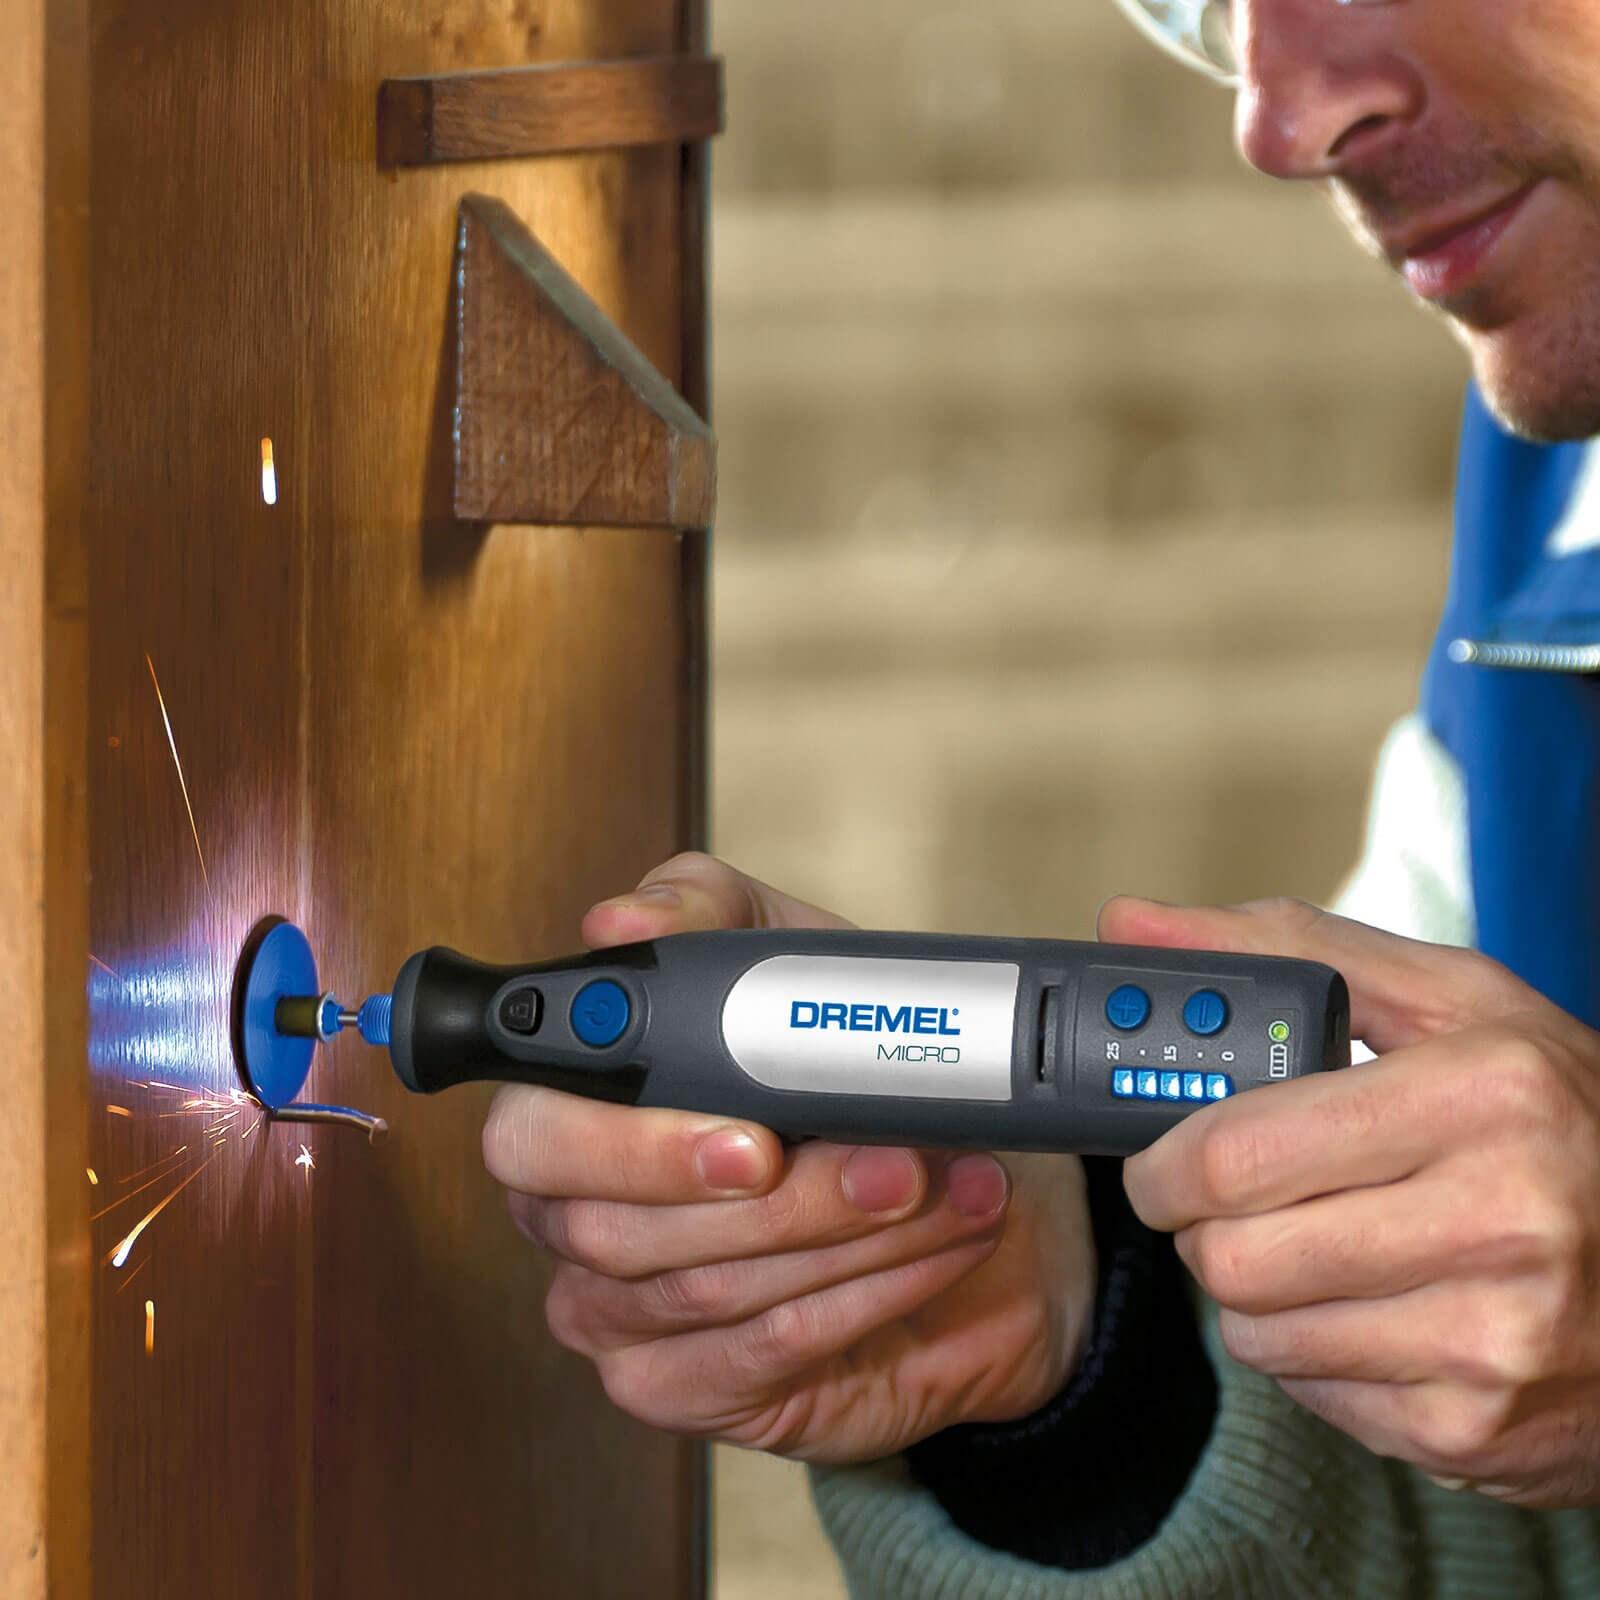 dremel micro 7.2v cordless rotary multi tool 35 accessory kit